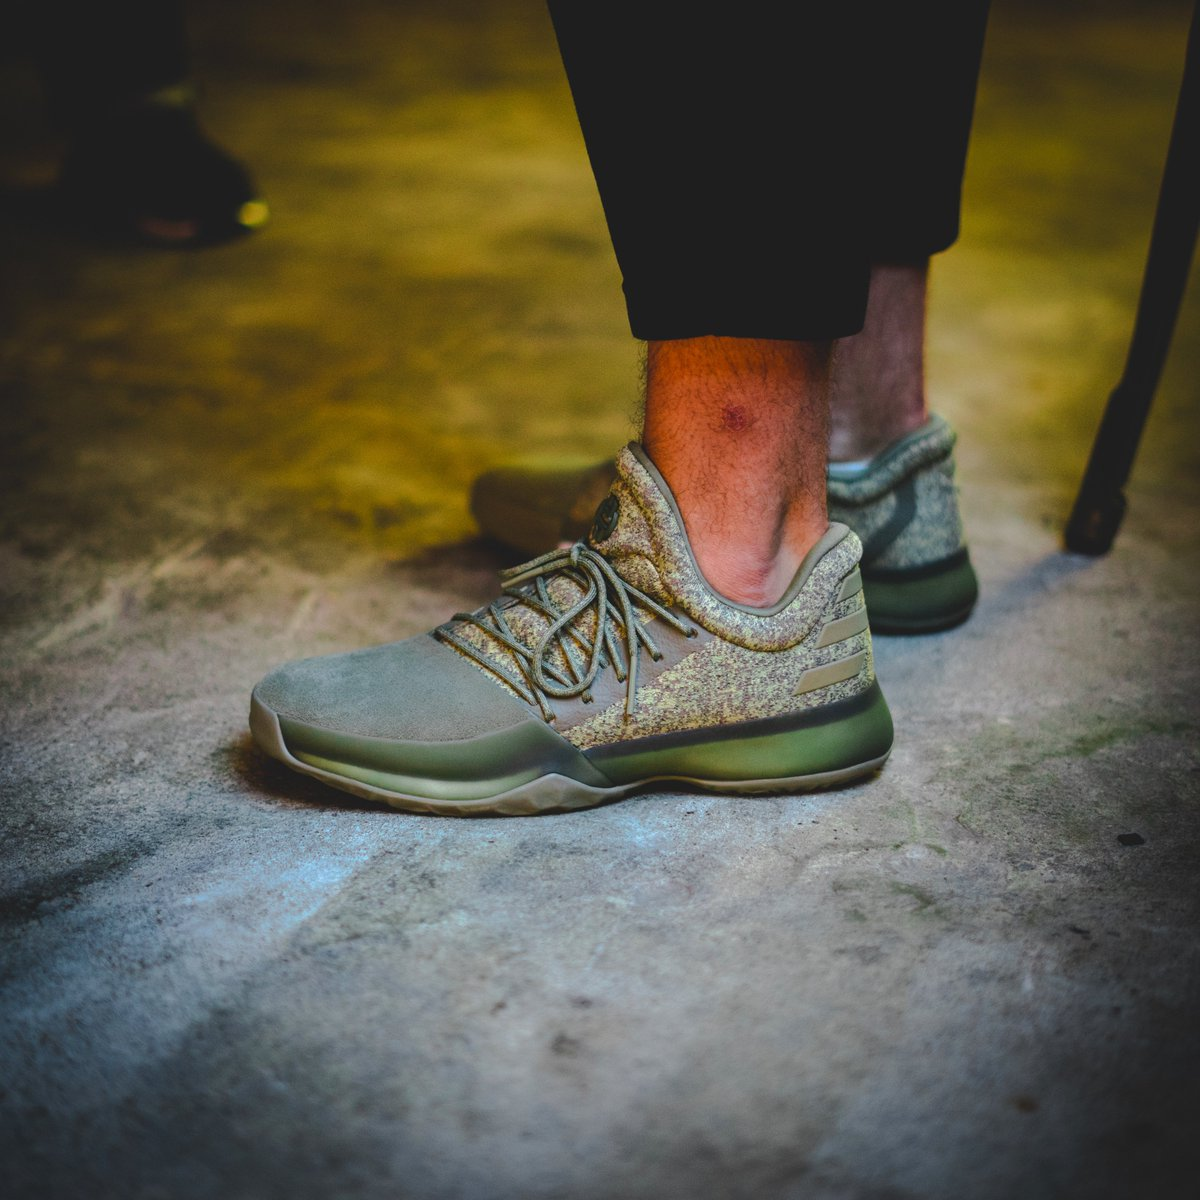 Adidas Harden Vol 1 On Feet